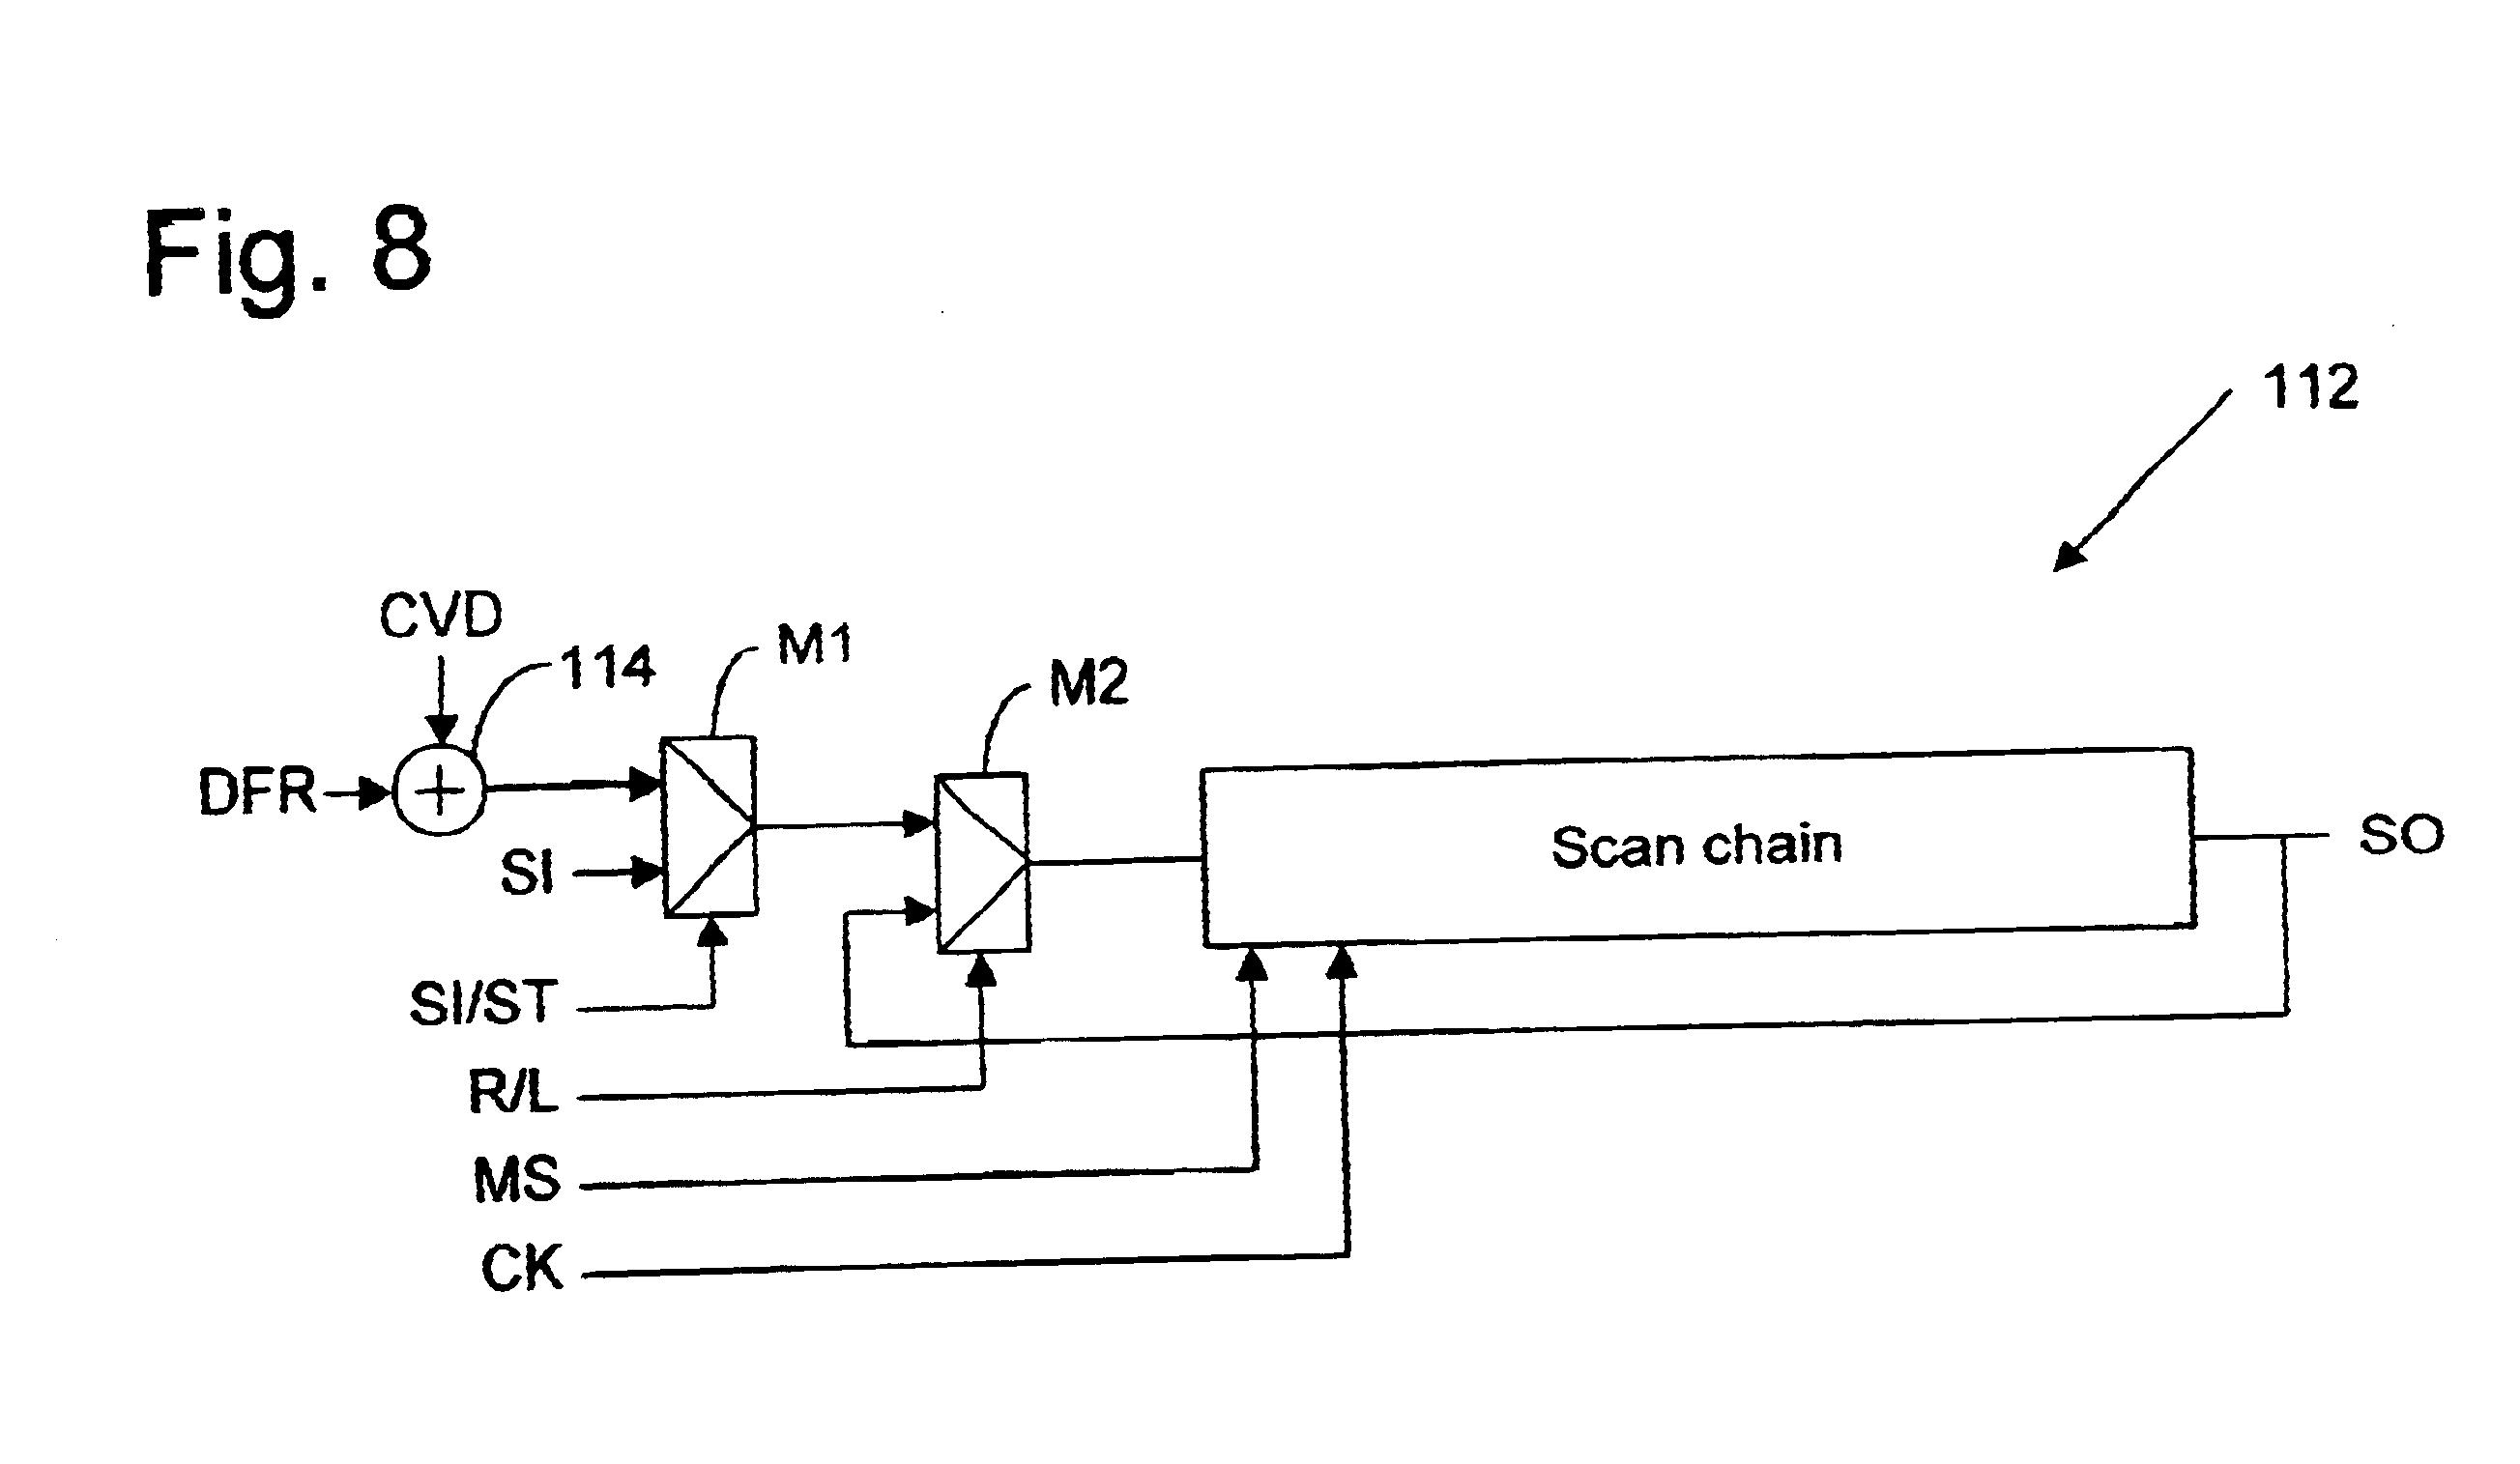 Brevetto US6662327 - Method for clustered test pattern